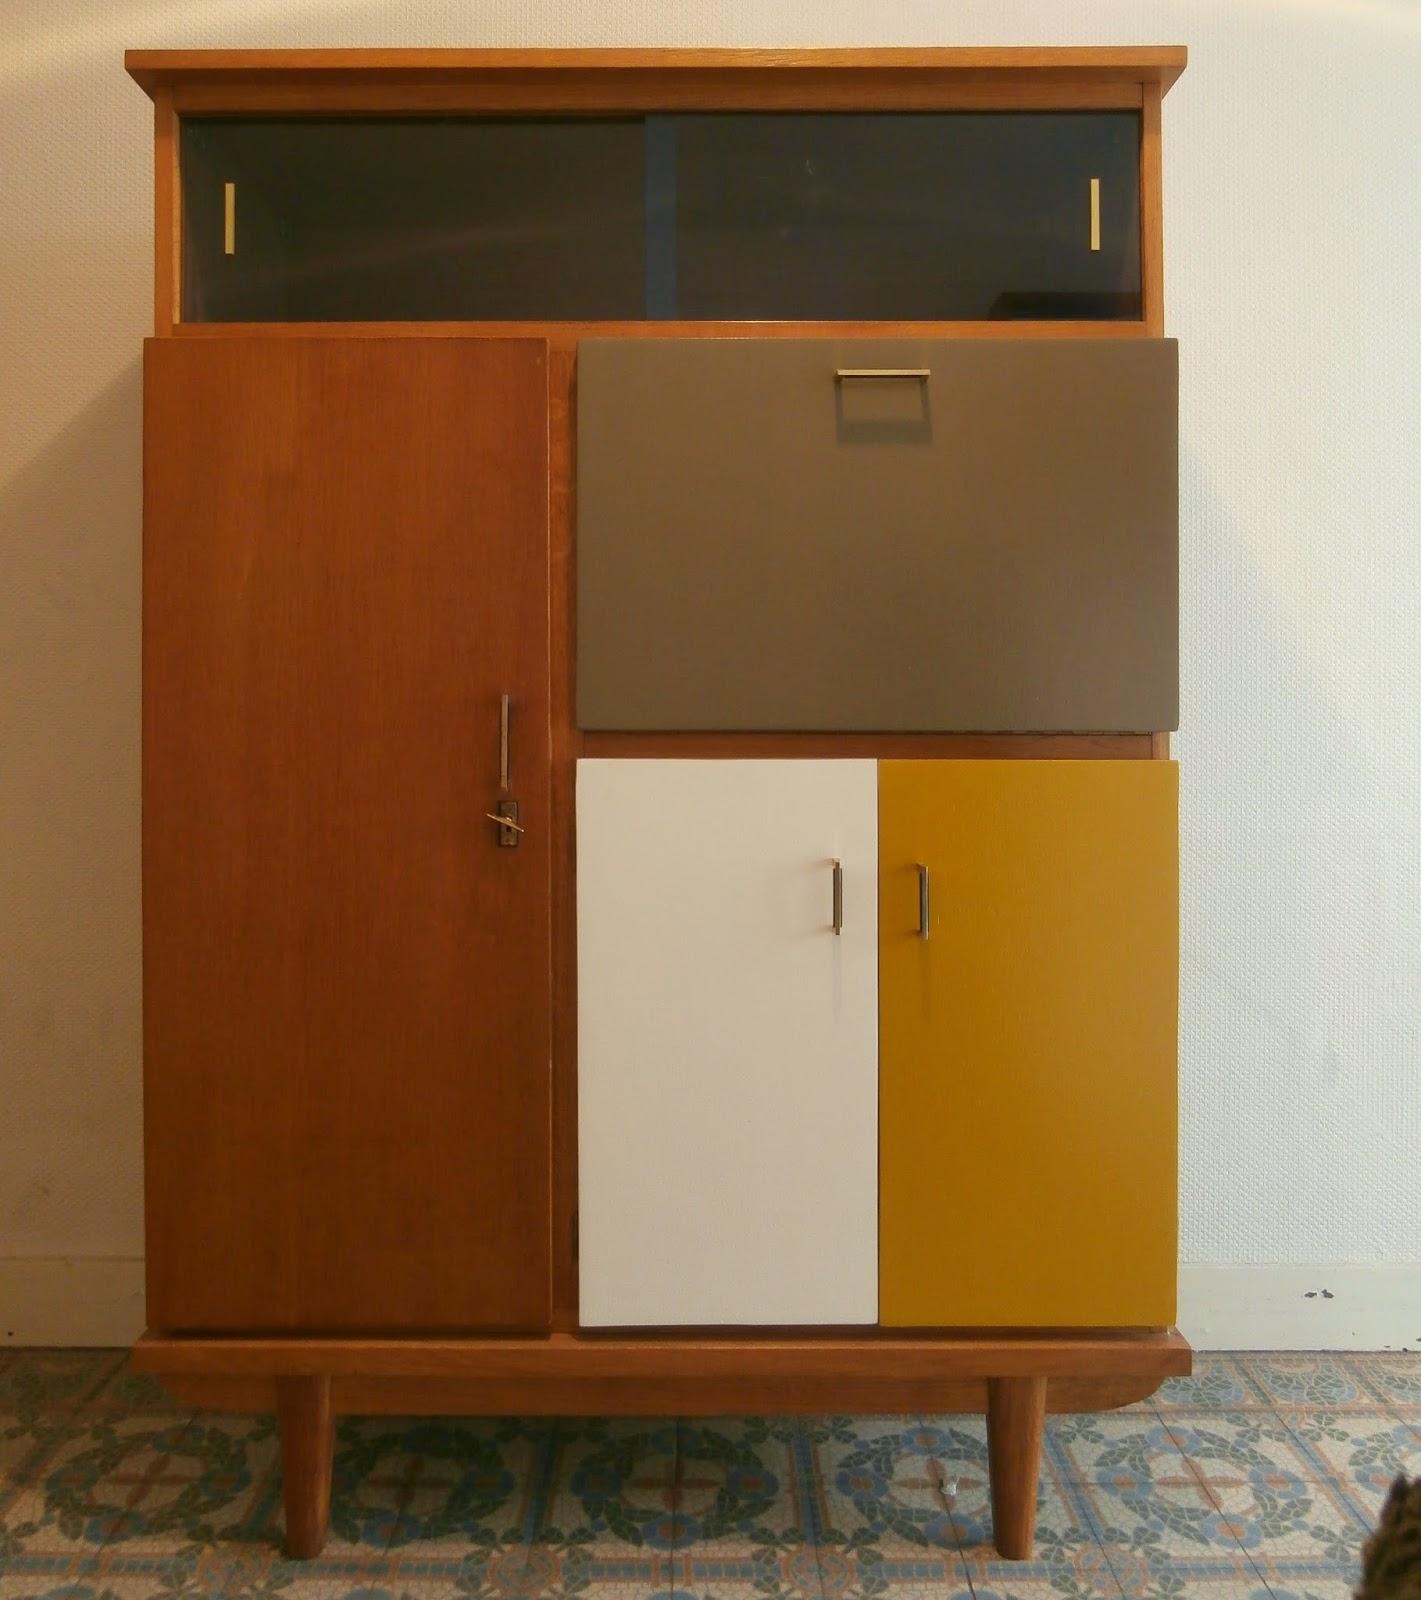 dur e de vie ind termin e meuble secr taire vitrine en. Black Bedroom Furniture Sets. Home Design Ideas